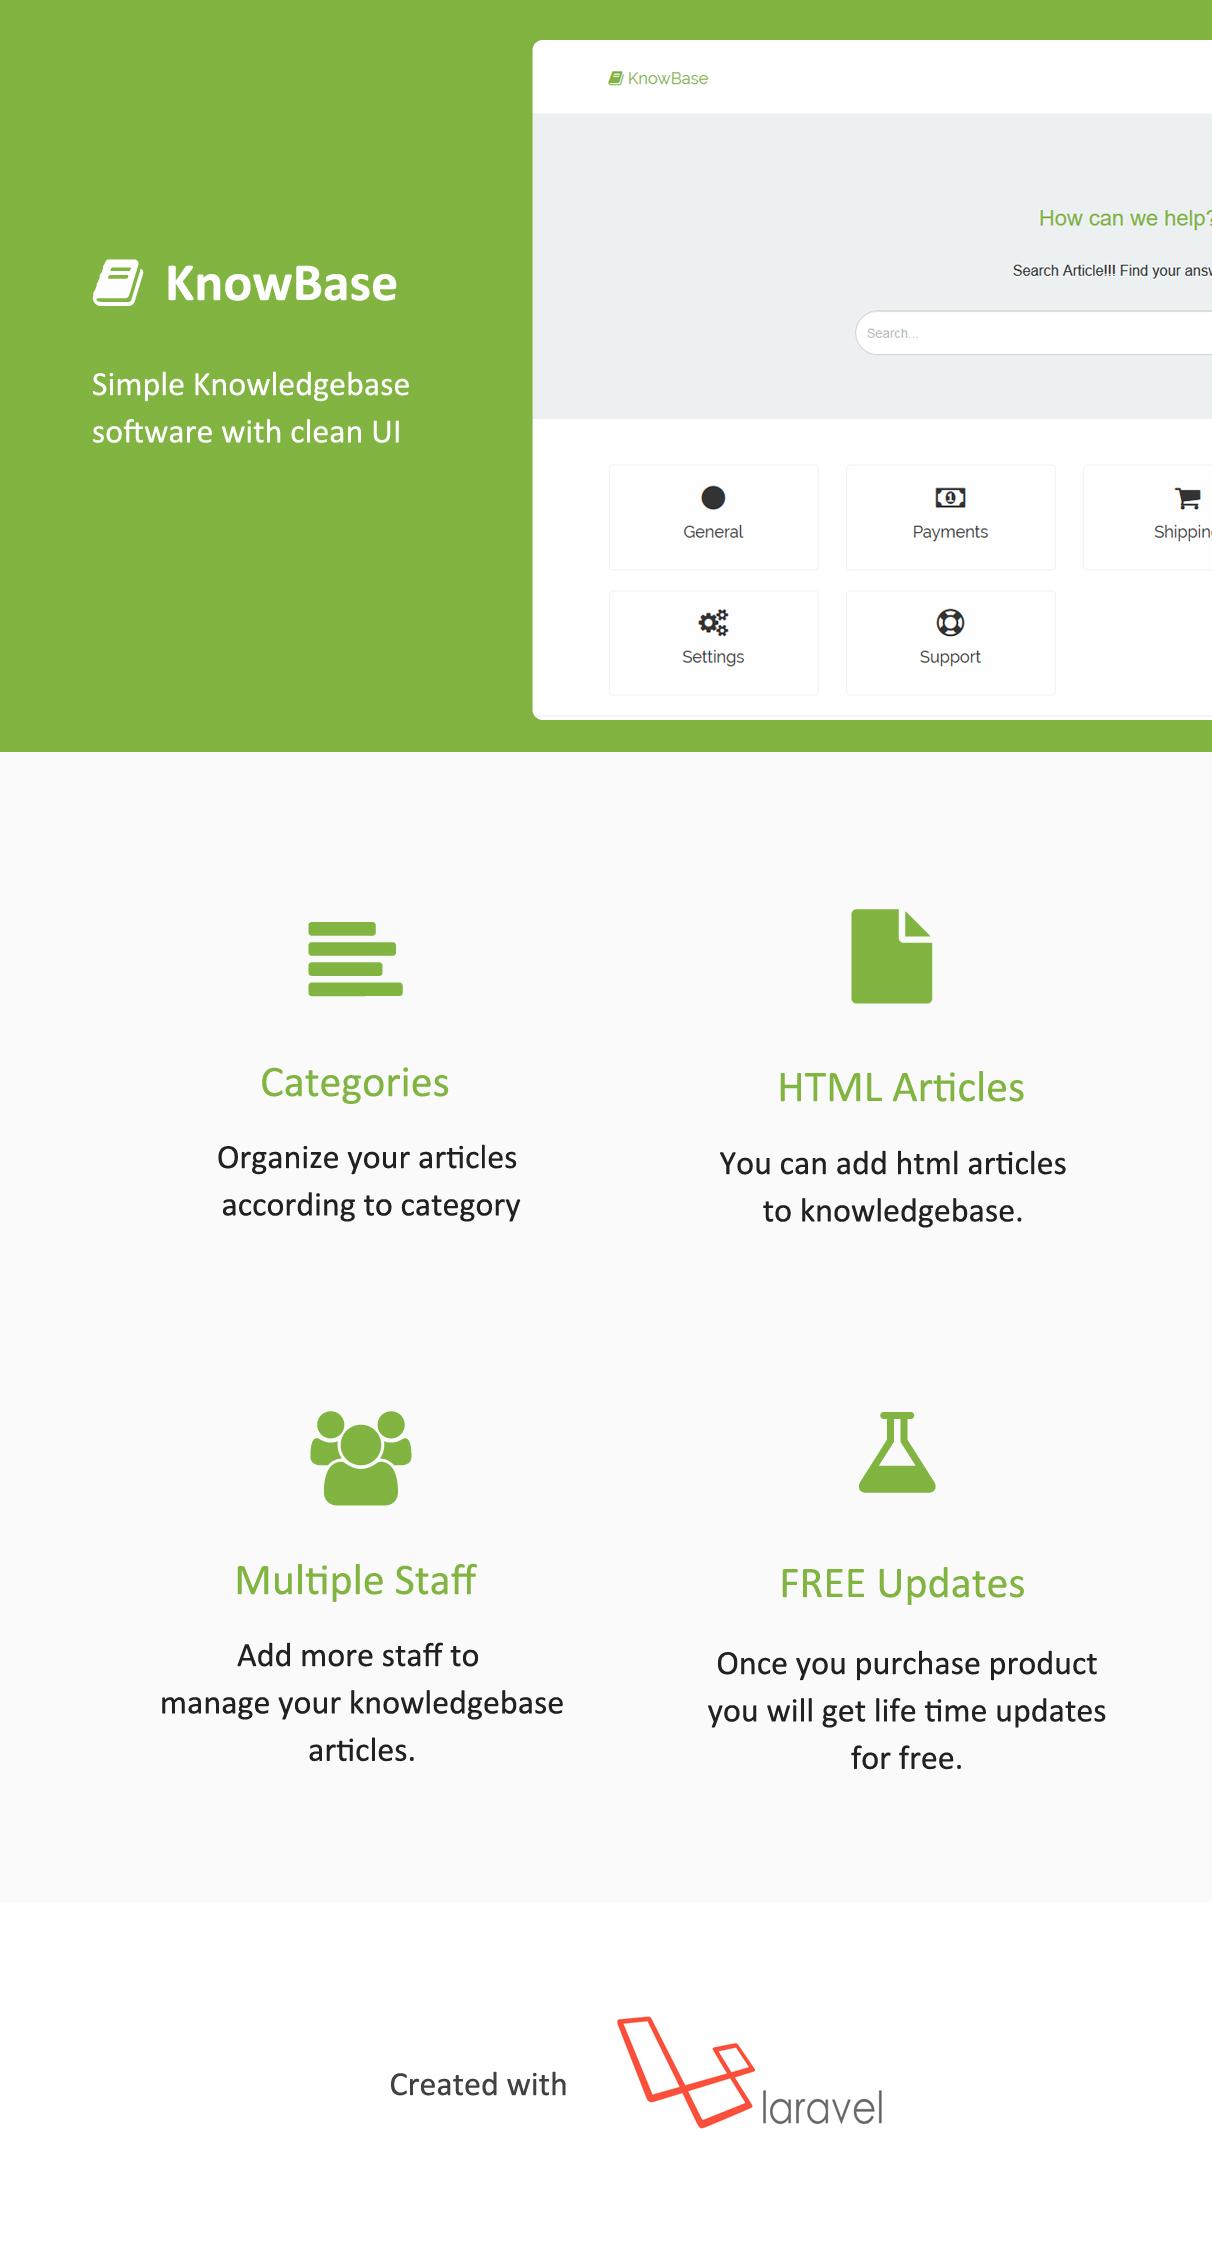 knowbase - Bilgi Sistemi - 8